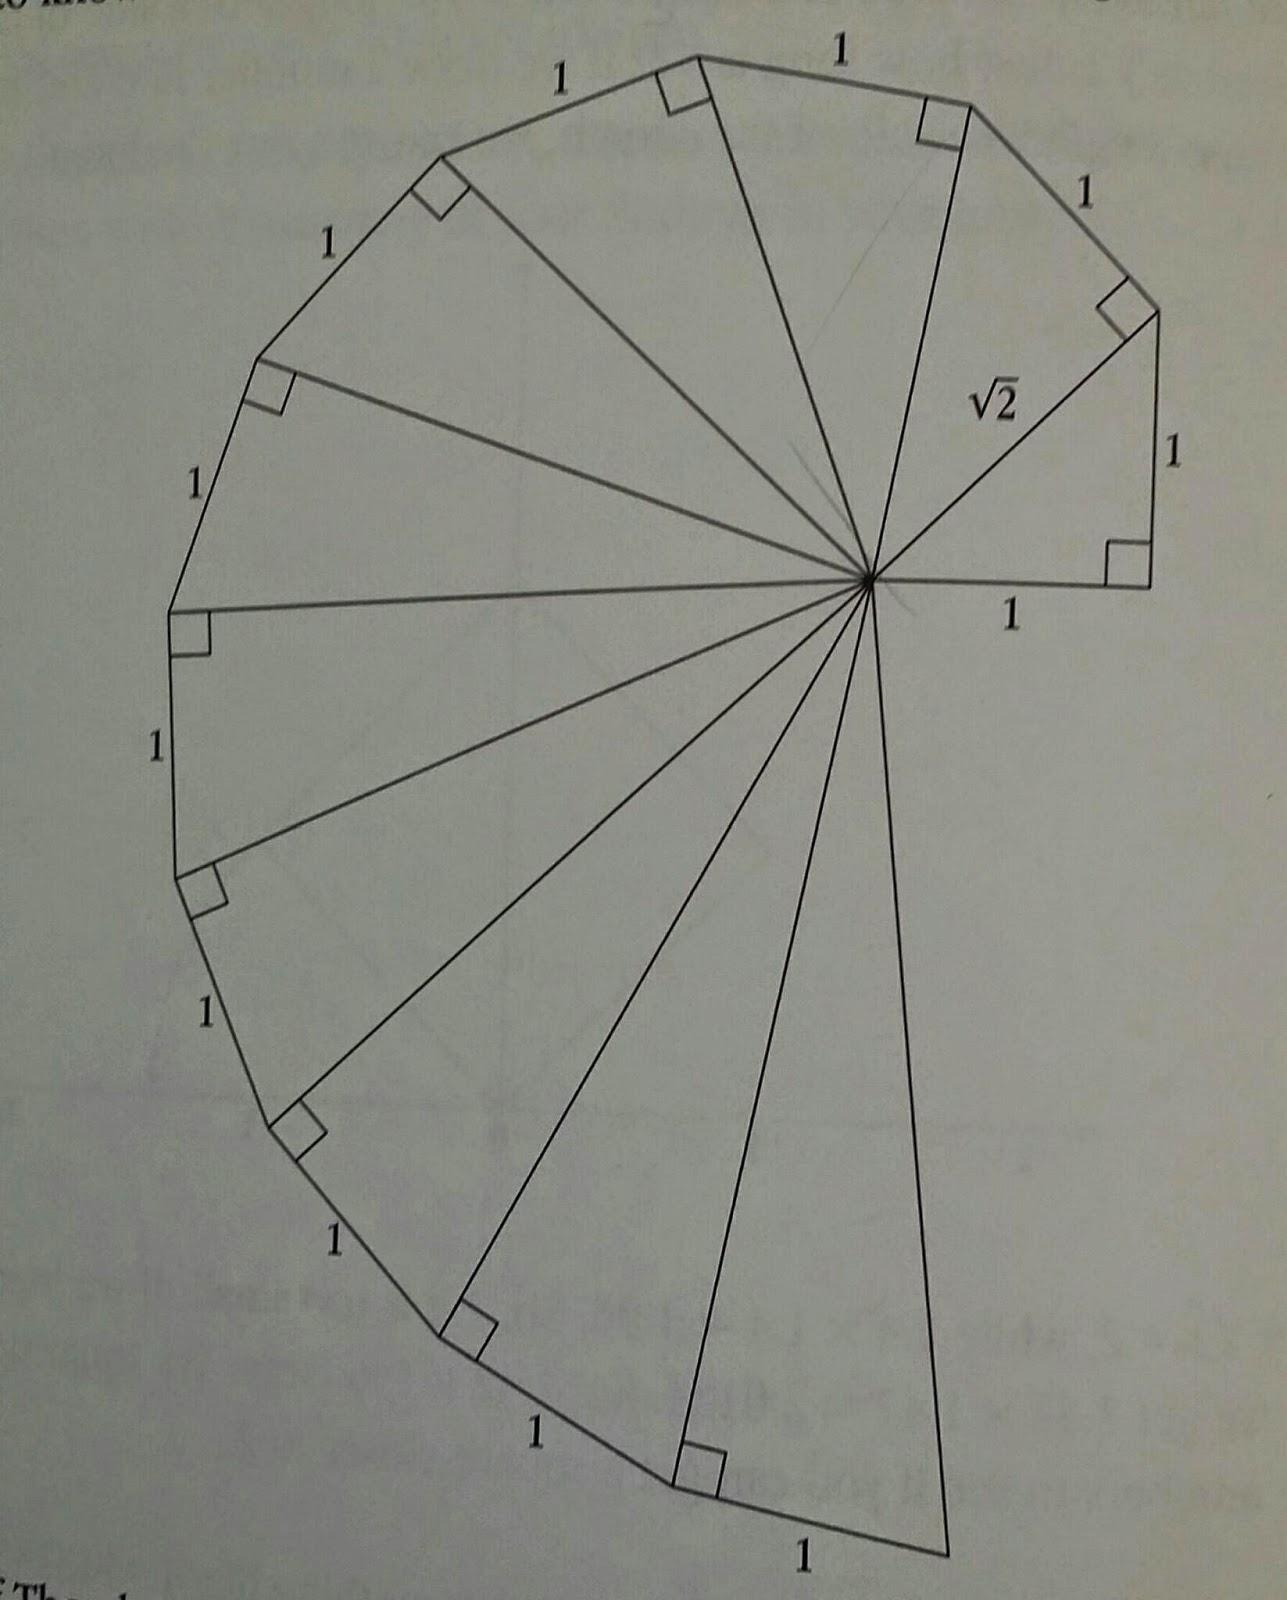 8th Grade - Carbajals Math class: 5.1 The wheel of Theodorus